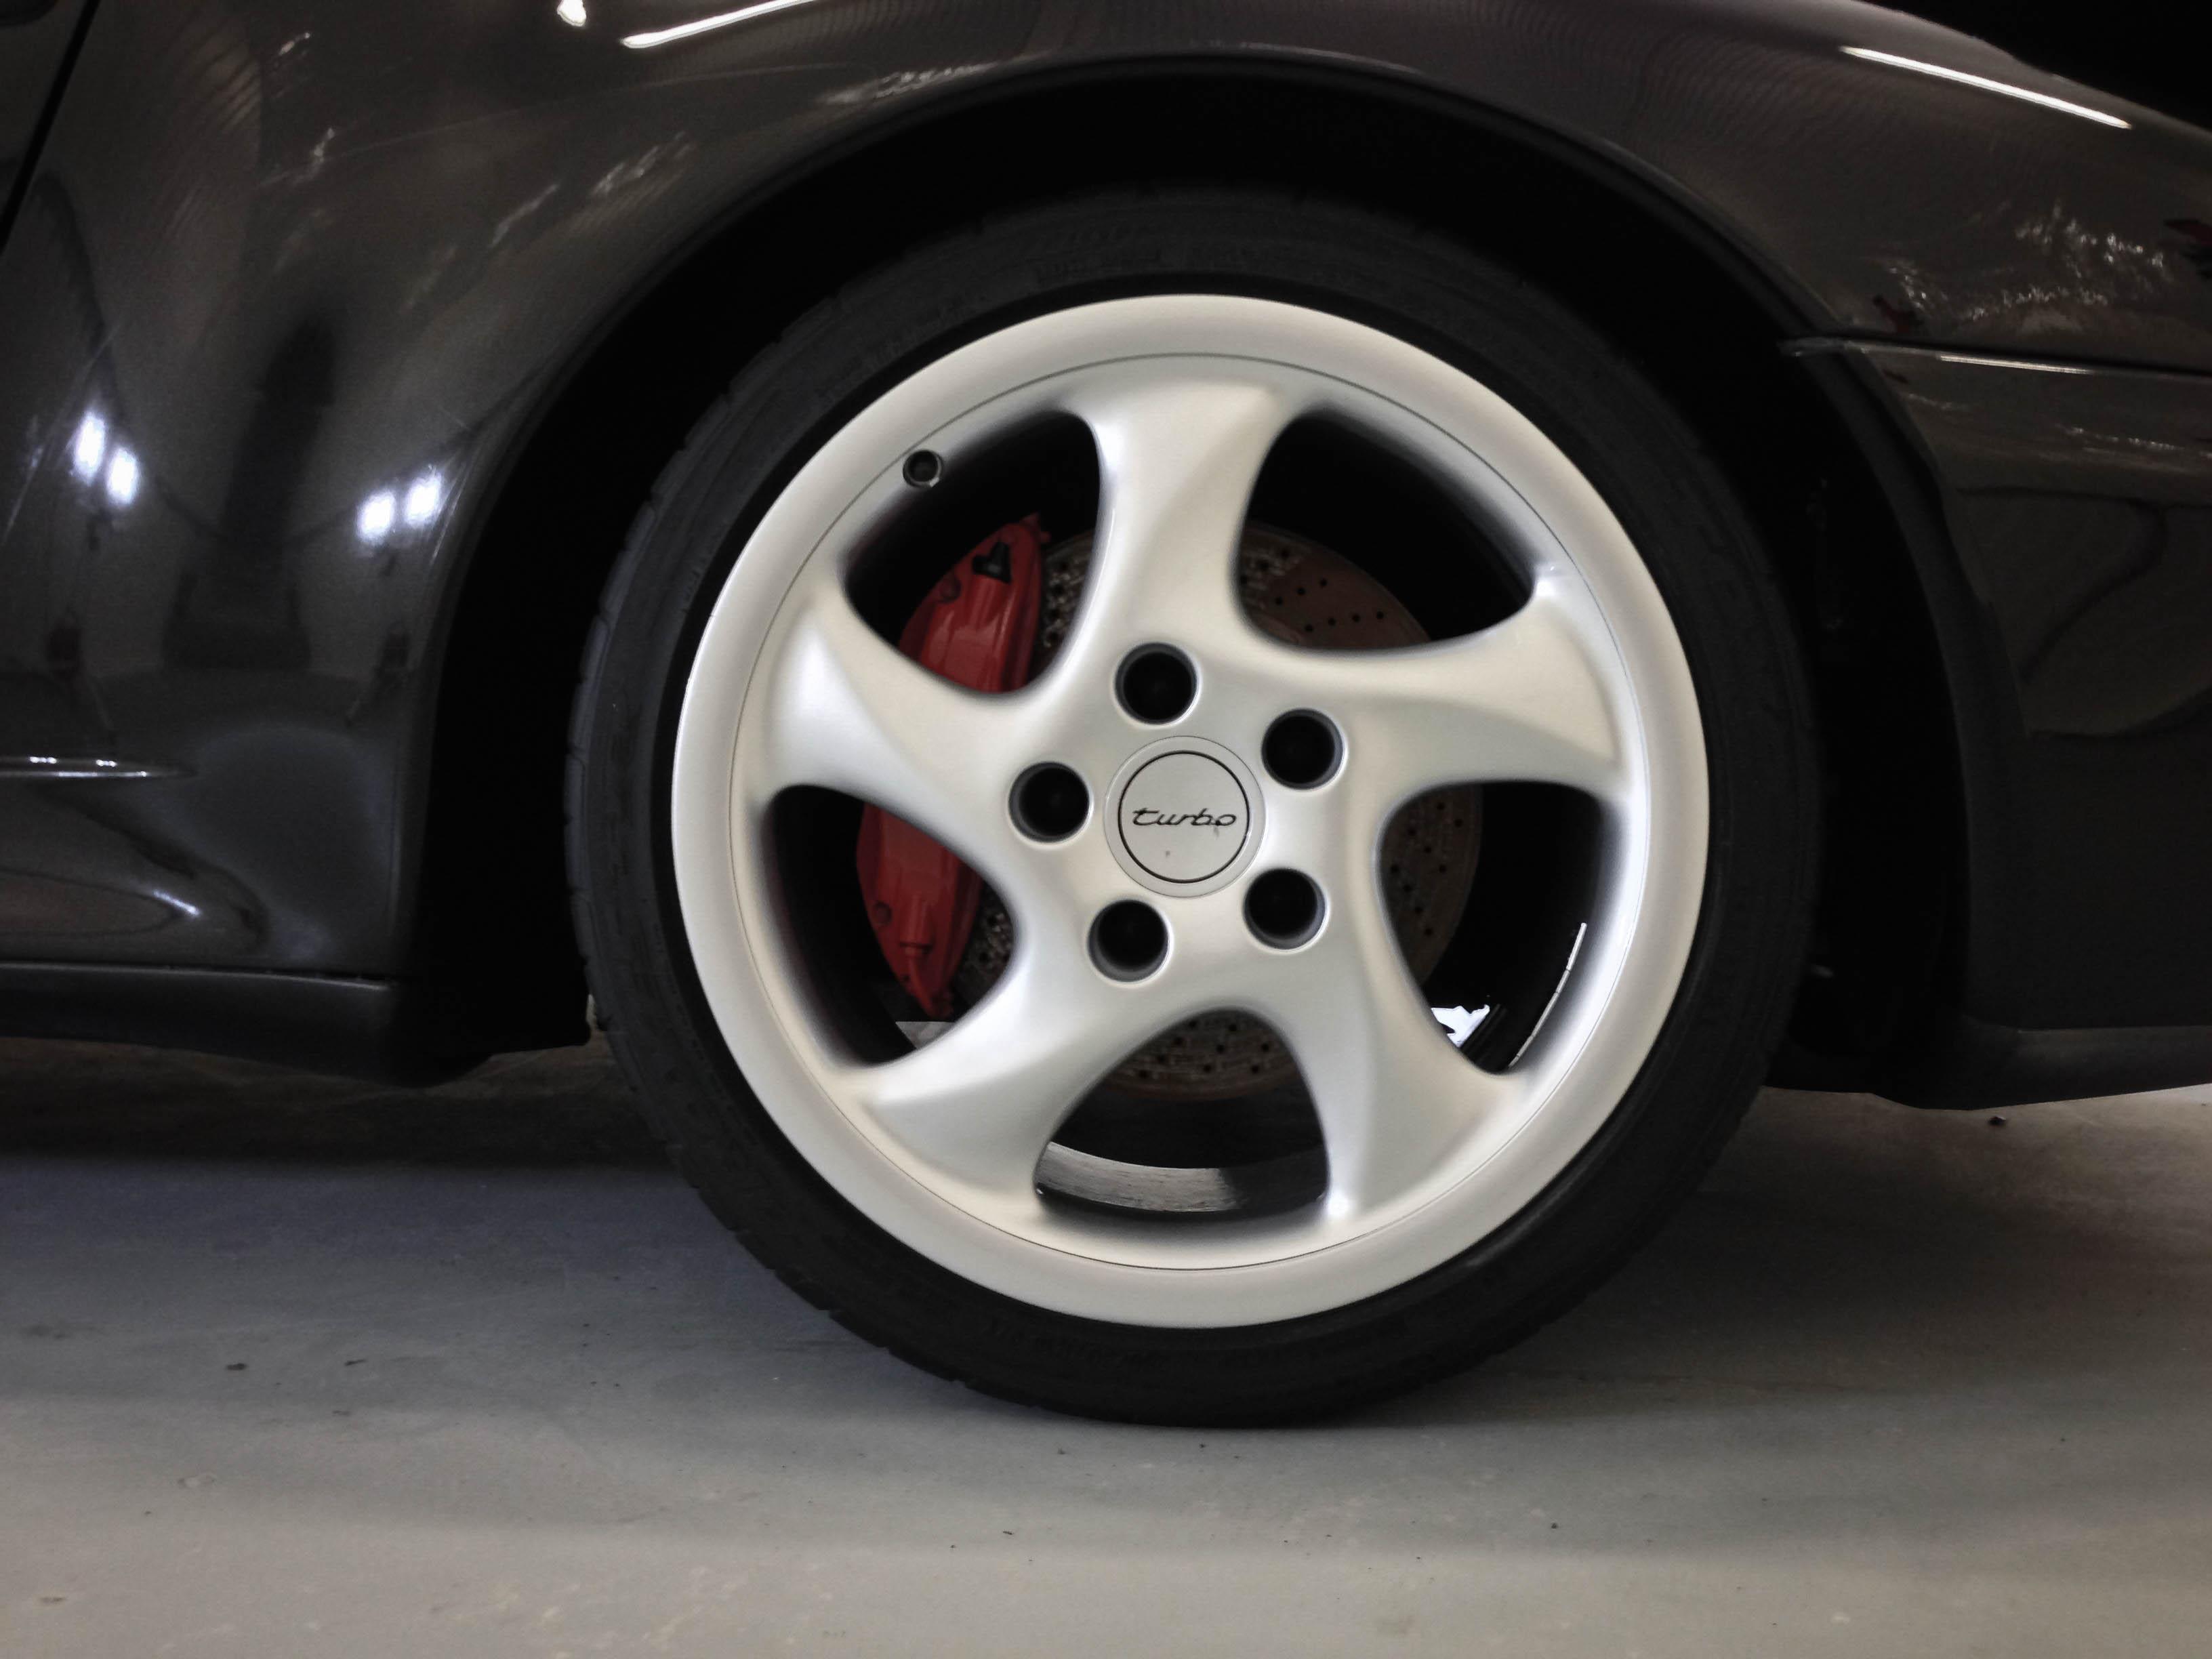 Porsche 911 Turbo –Front Wheel